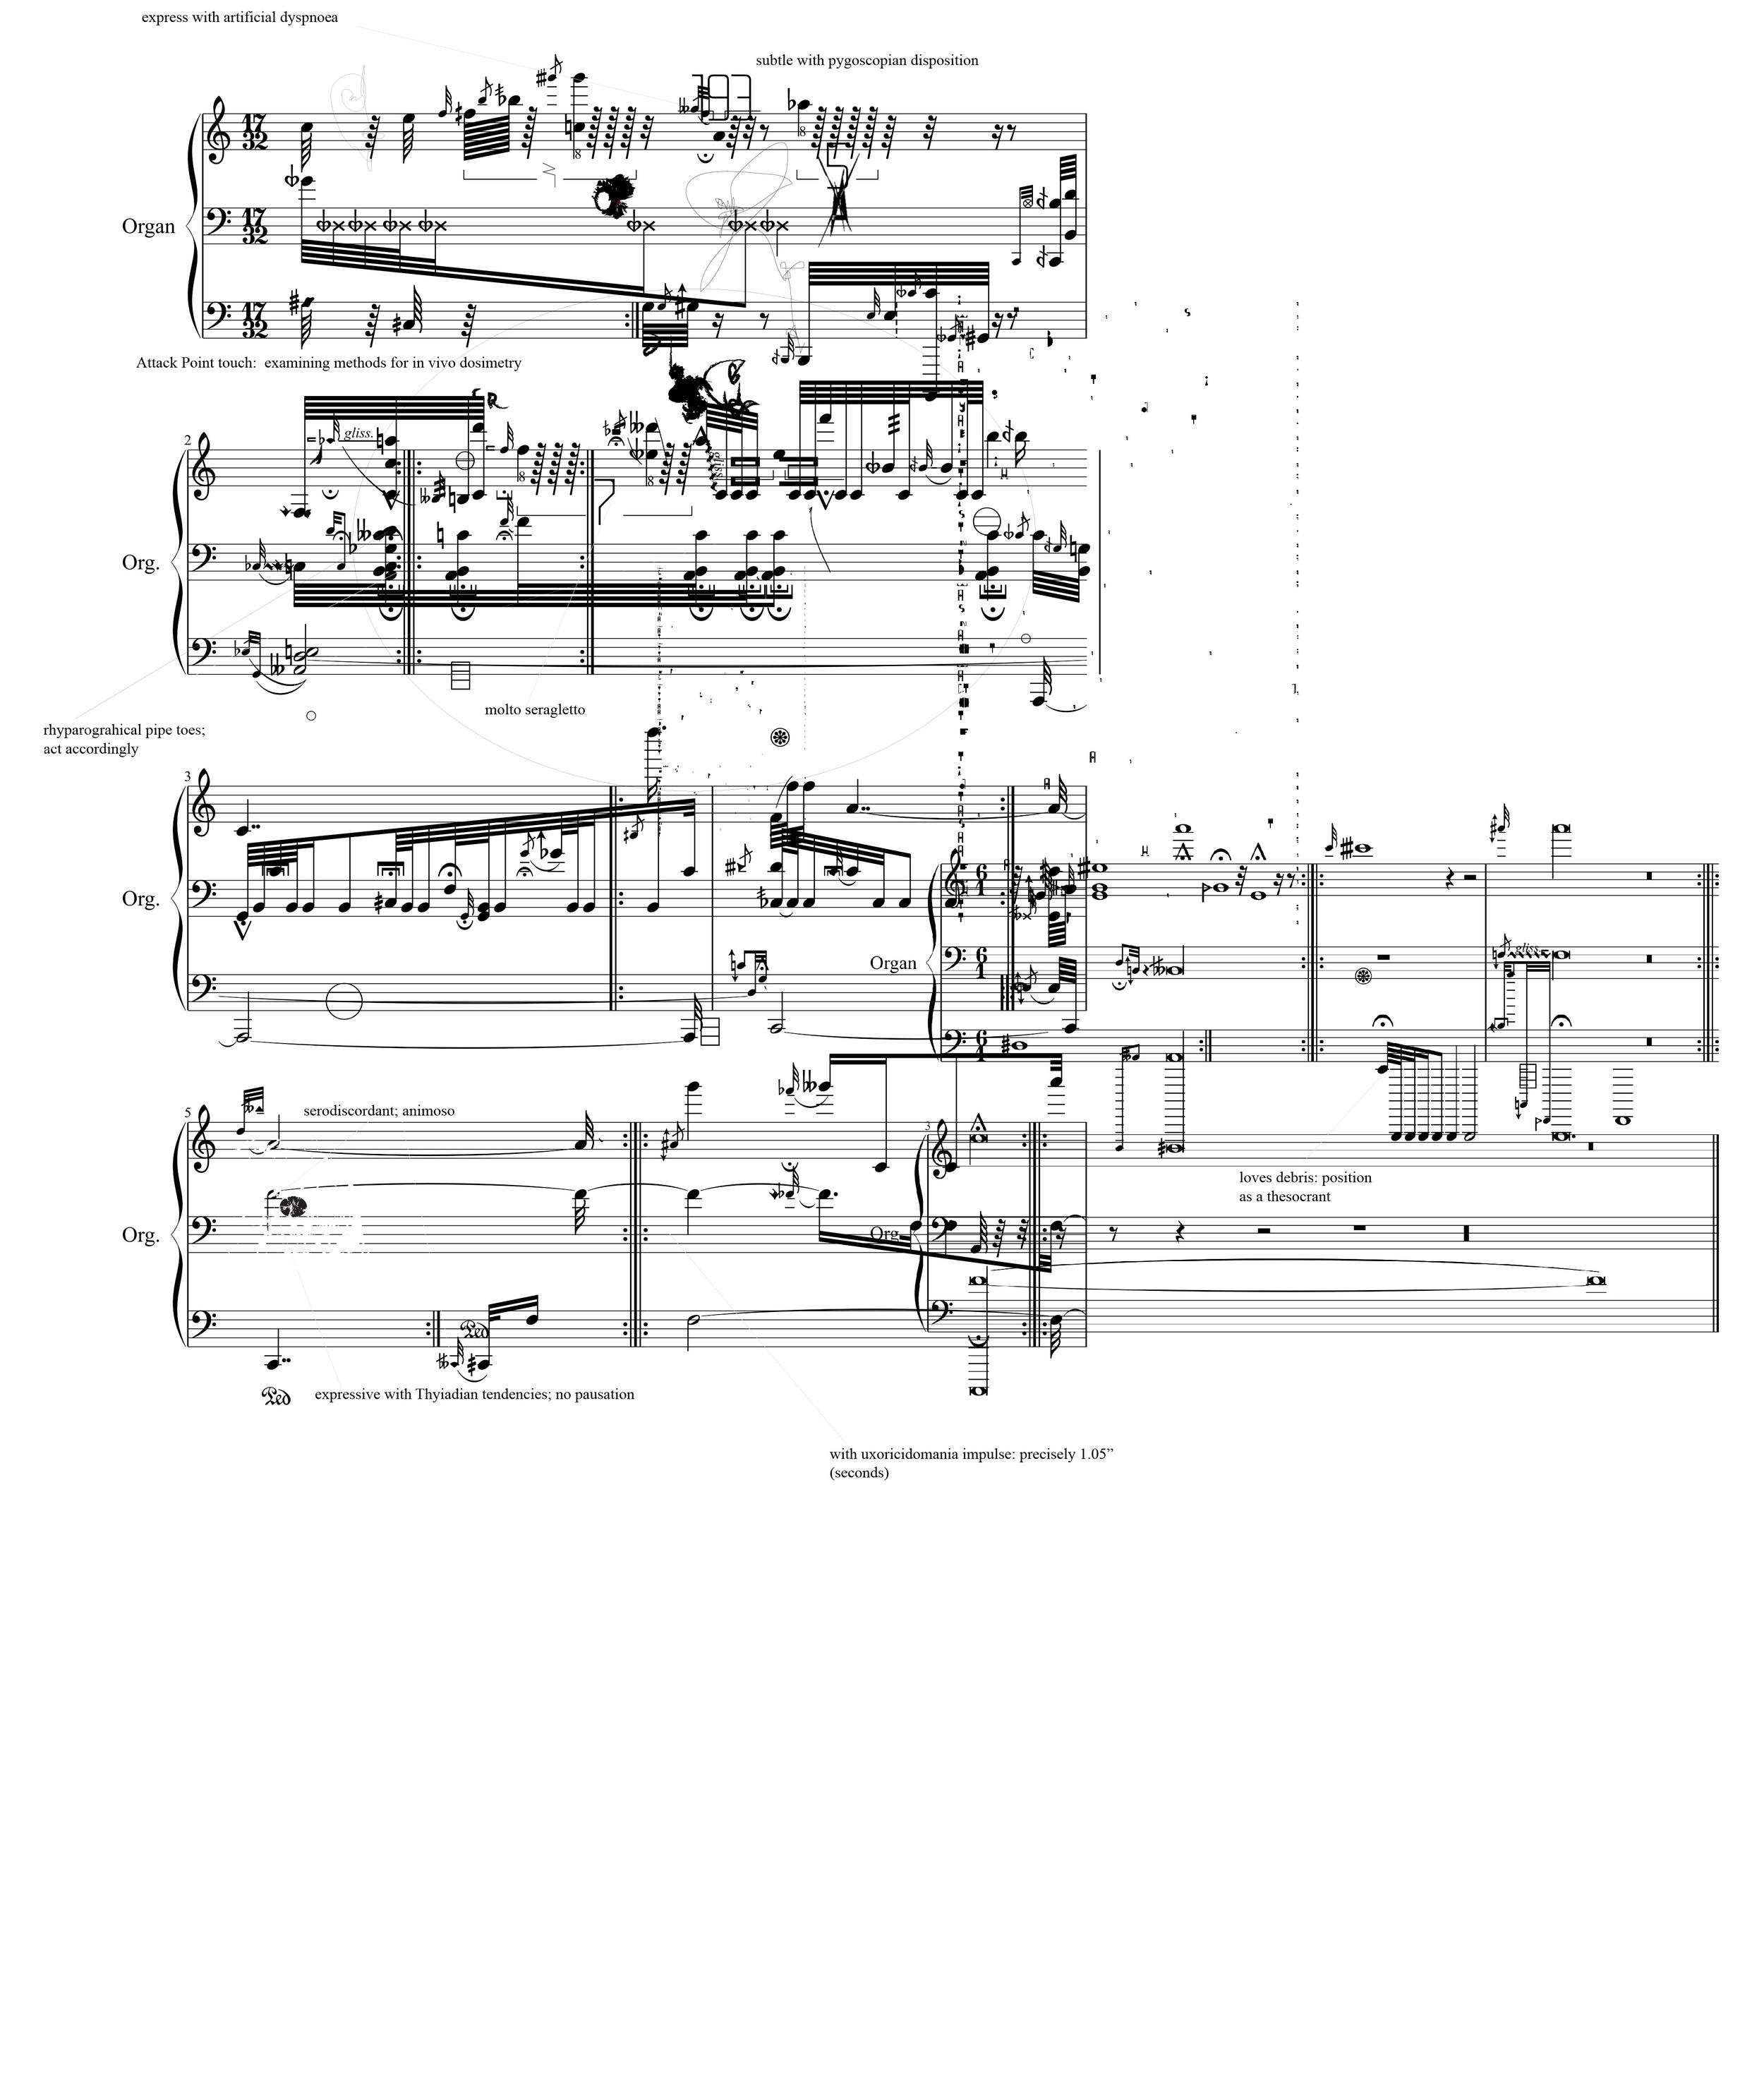 New project for Dapaegaci Organ